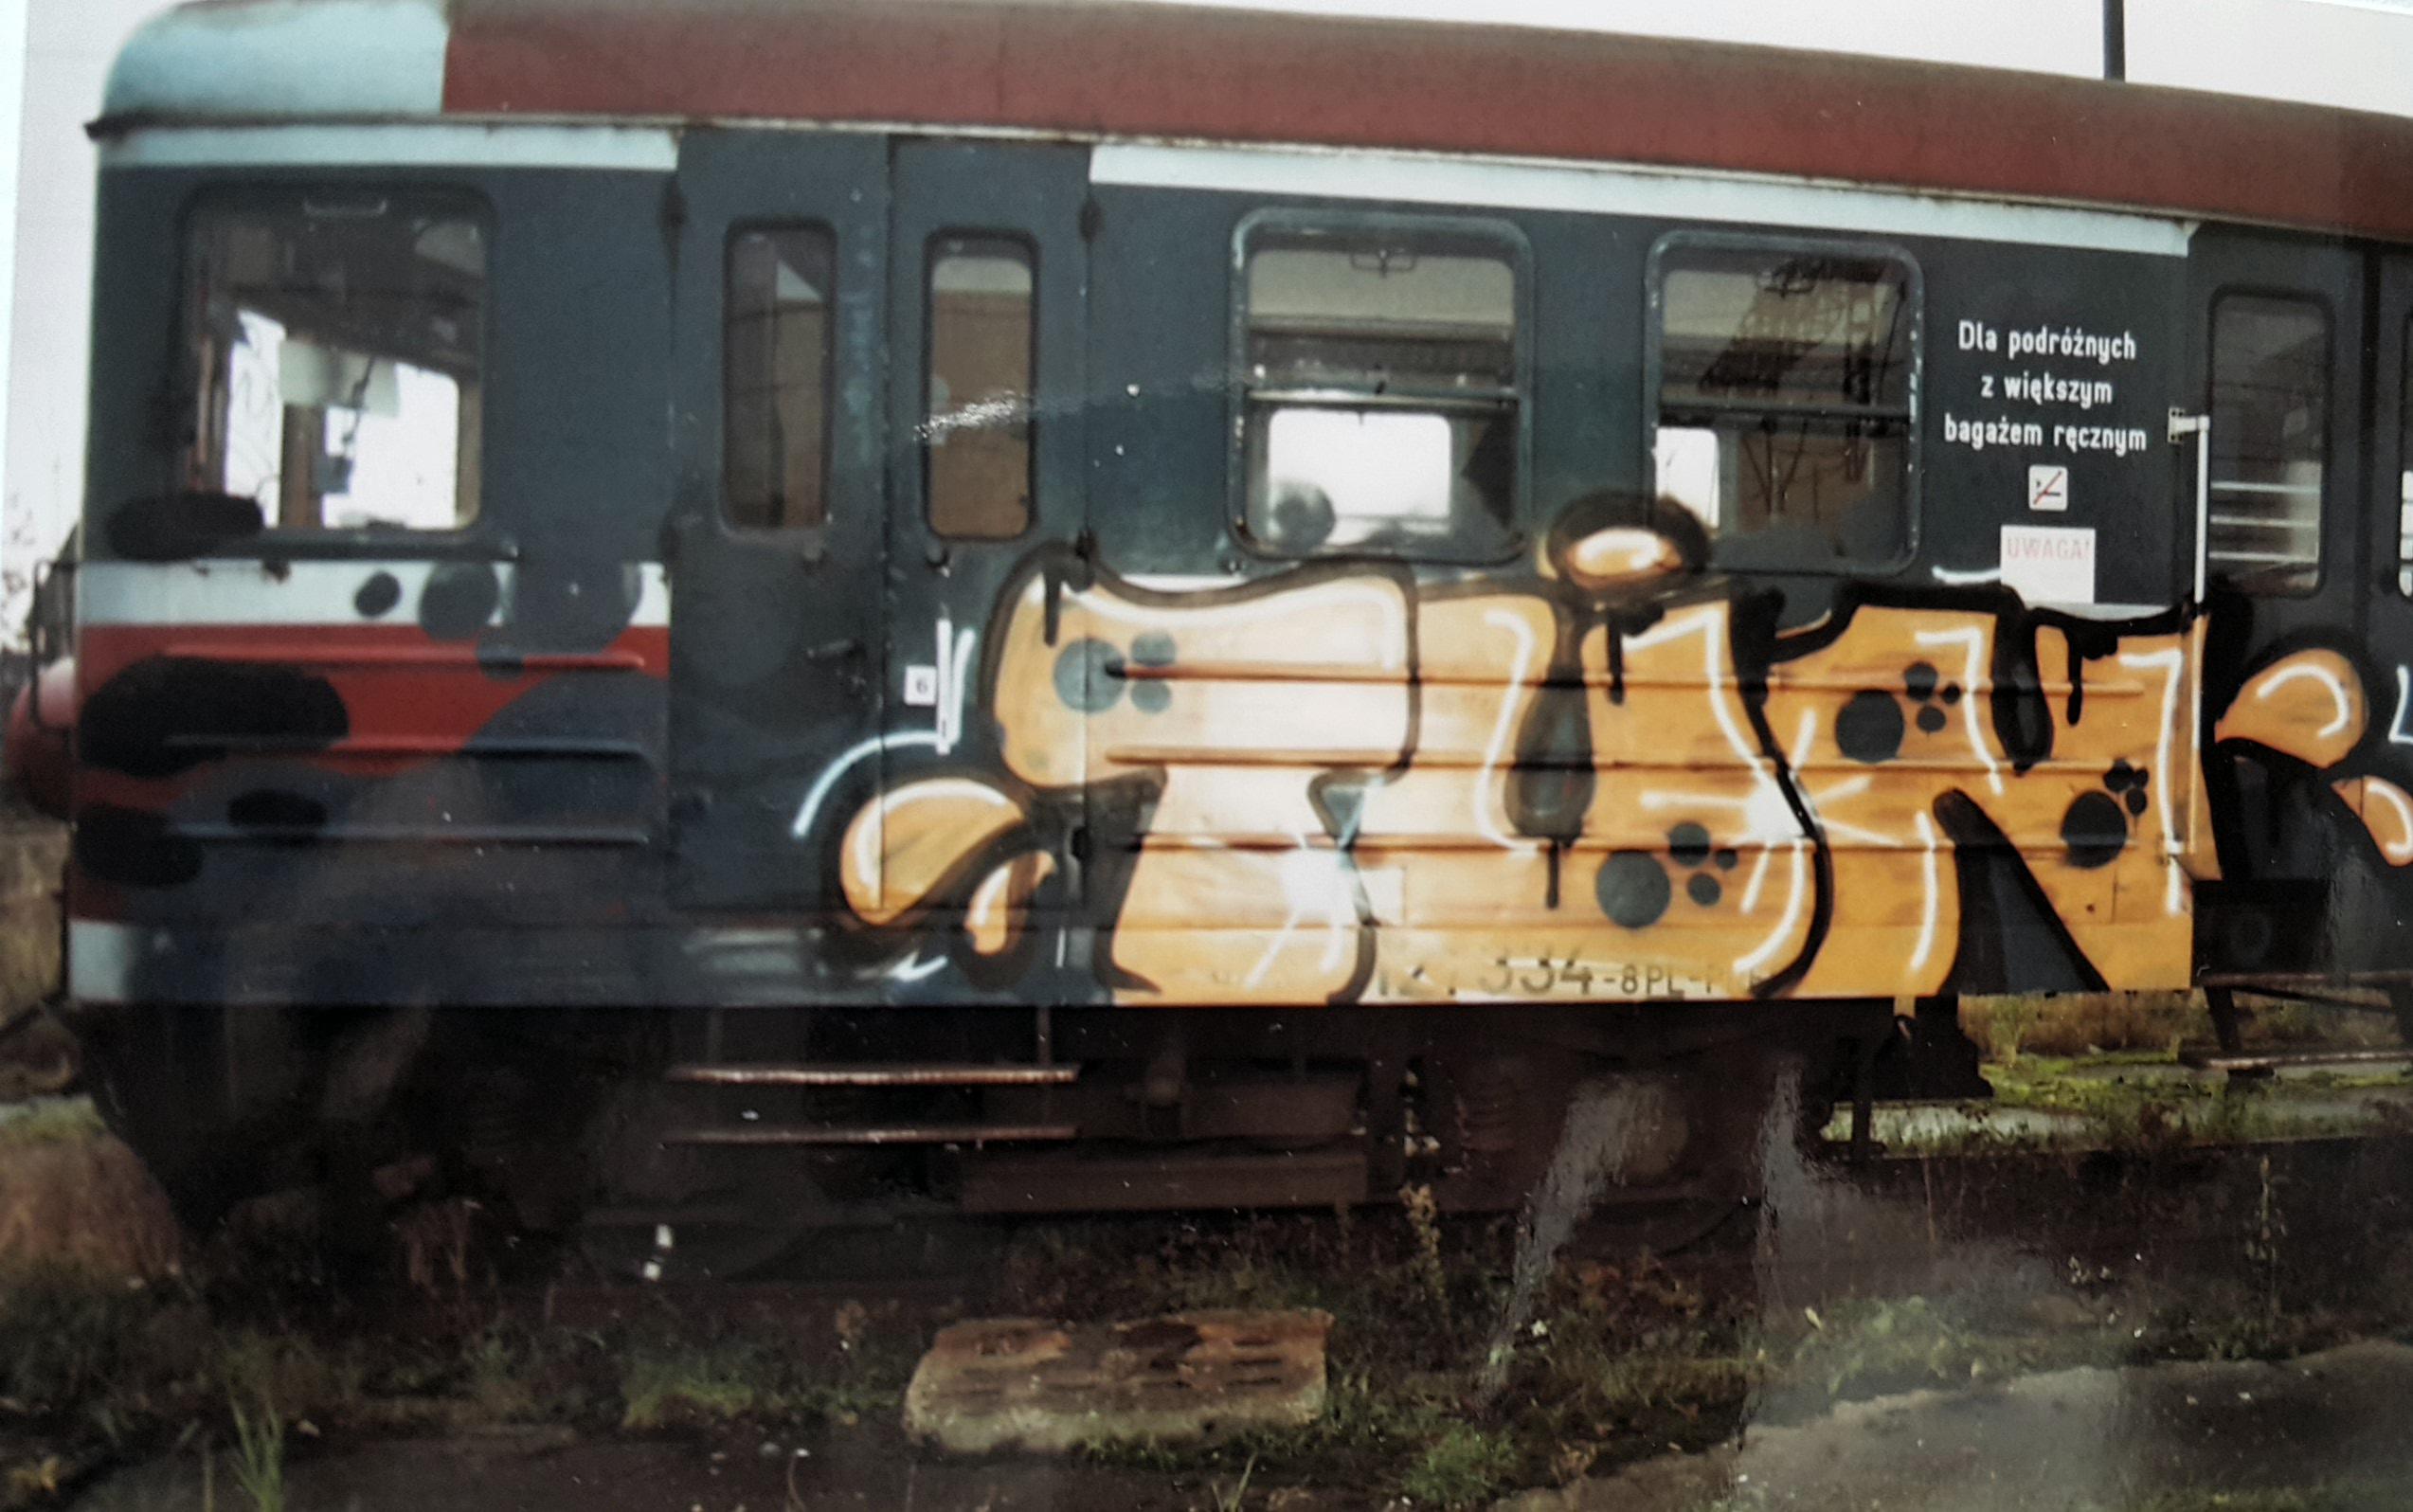 http://m.wm.pl/2018/03/orig/graffiti-podejrzanego-1-451943.jpg